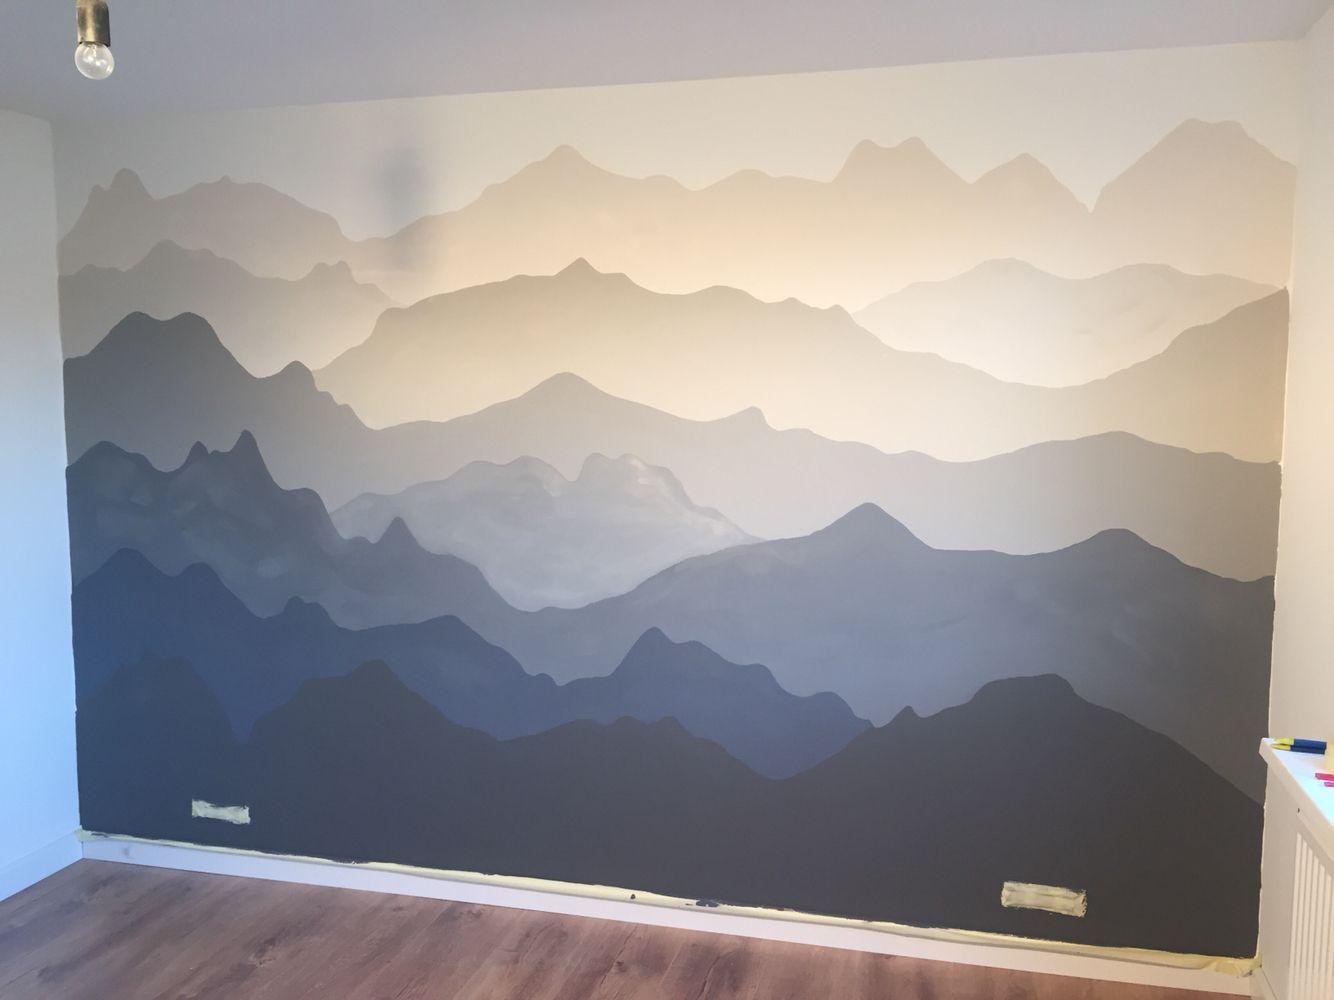 Berge Berge Berge Wallpaintingsgalaxy Wallpaintingsnature Wal Schlafzimmergestaltung Wandgestaltung Kinder Zimmer